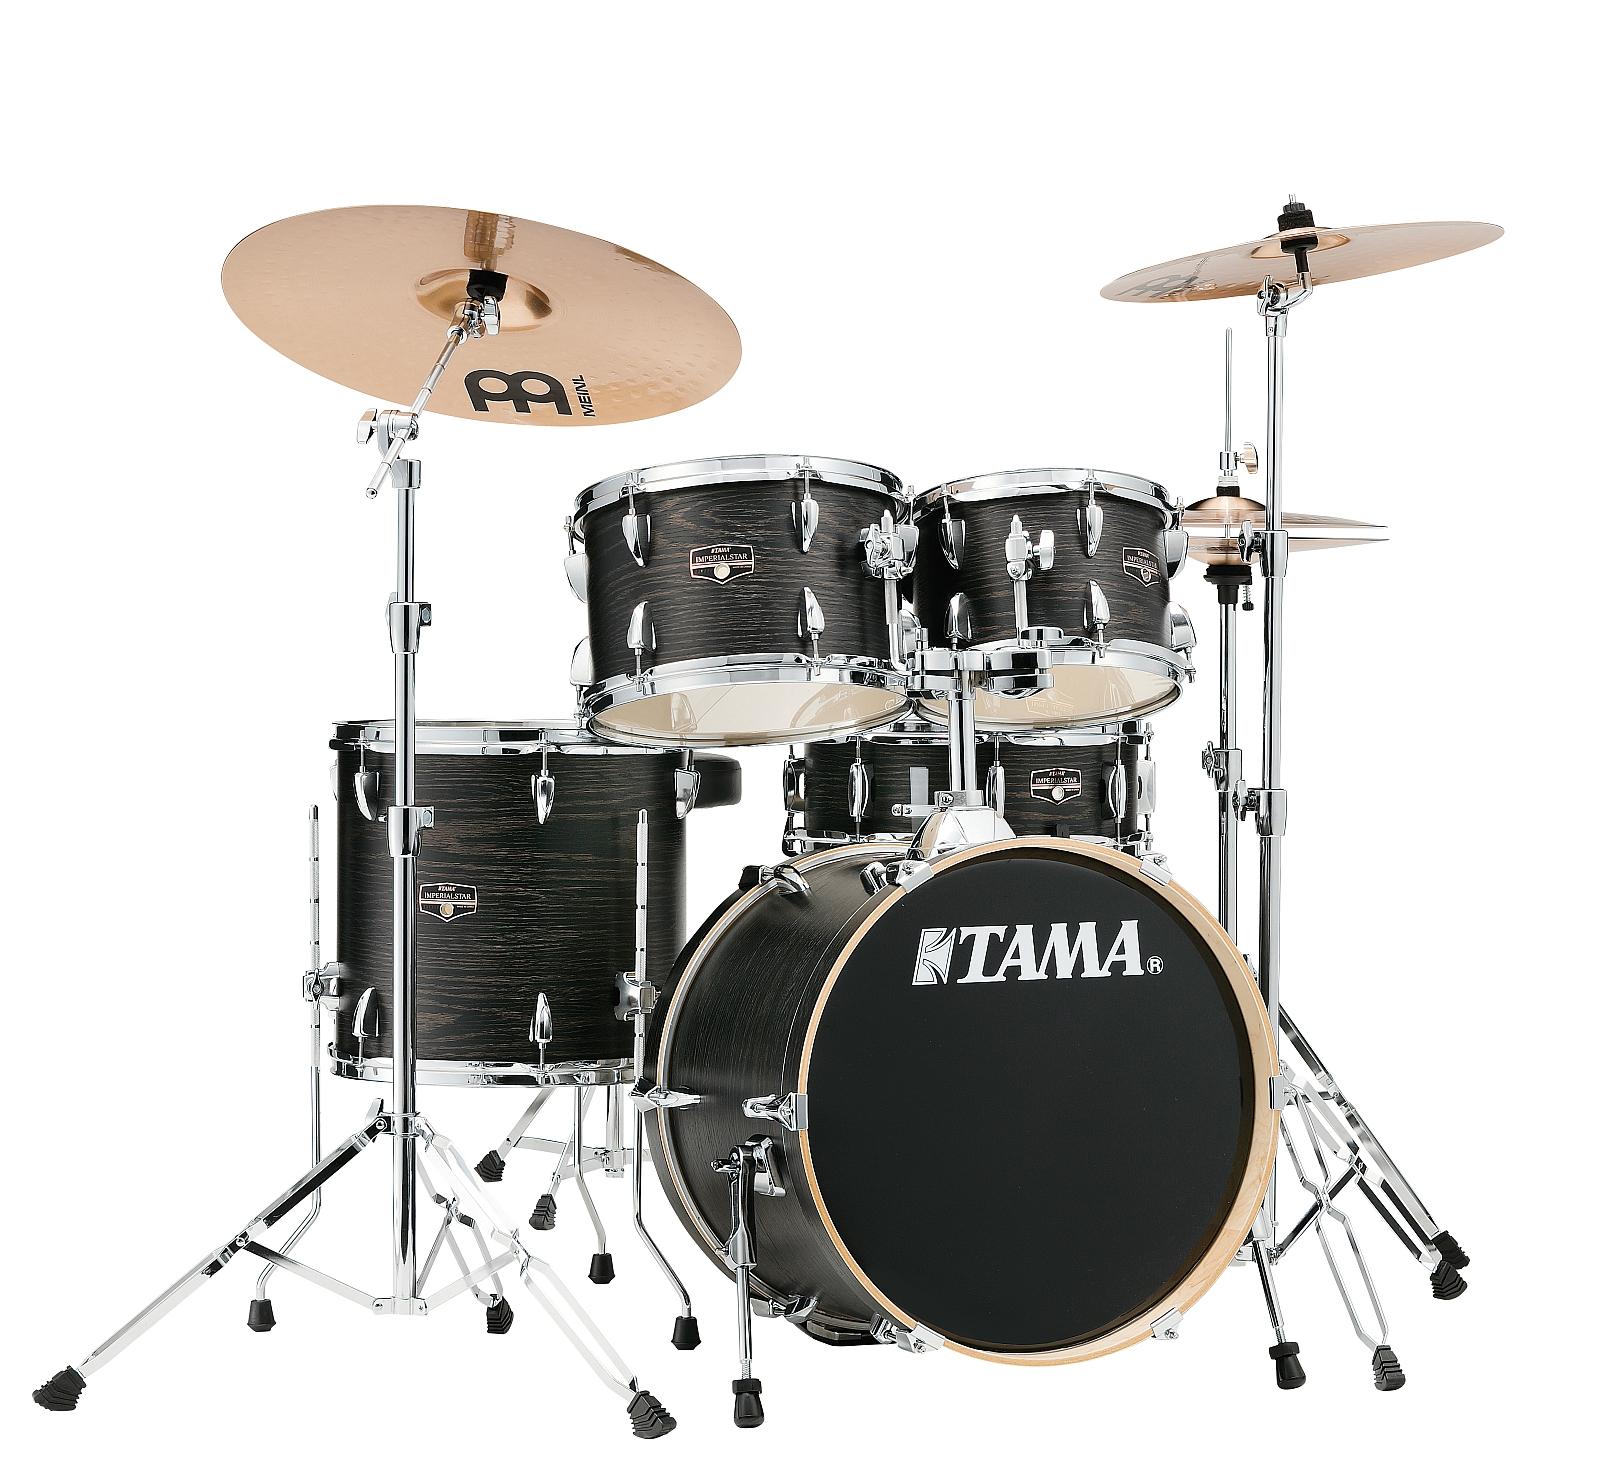 TAMA Imperialstar Drumset 5 teilig Black Oak Warp + MEINL HCSB Beckenset